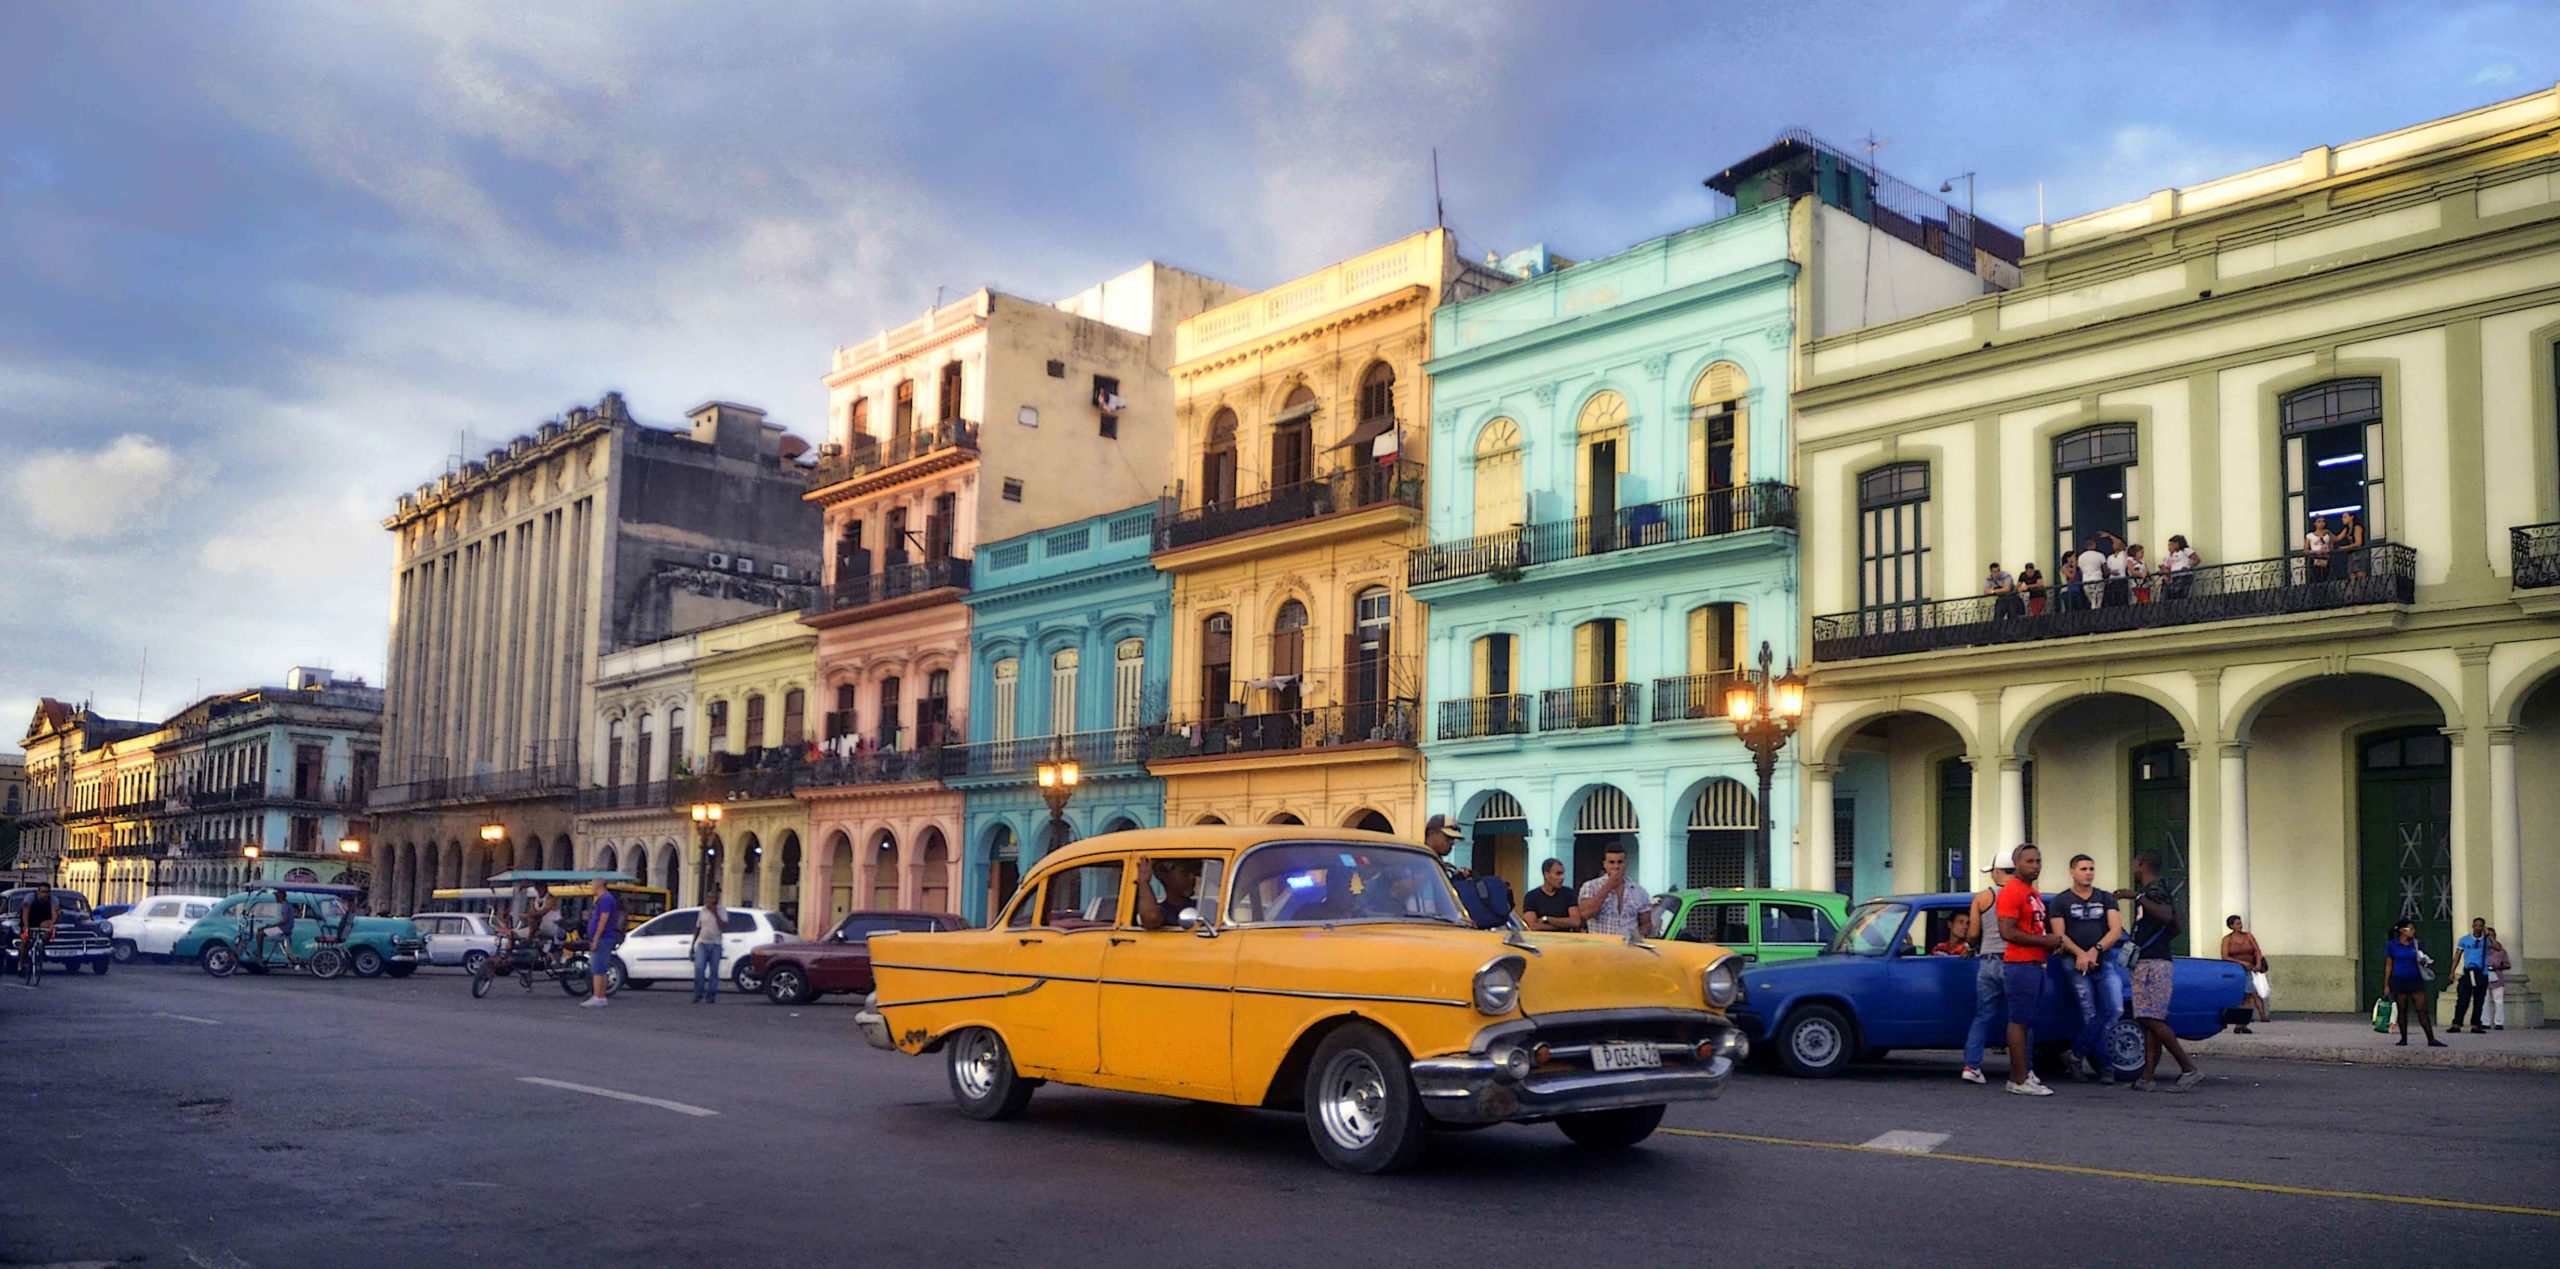 Cuba Piedra de Toque